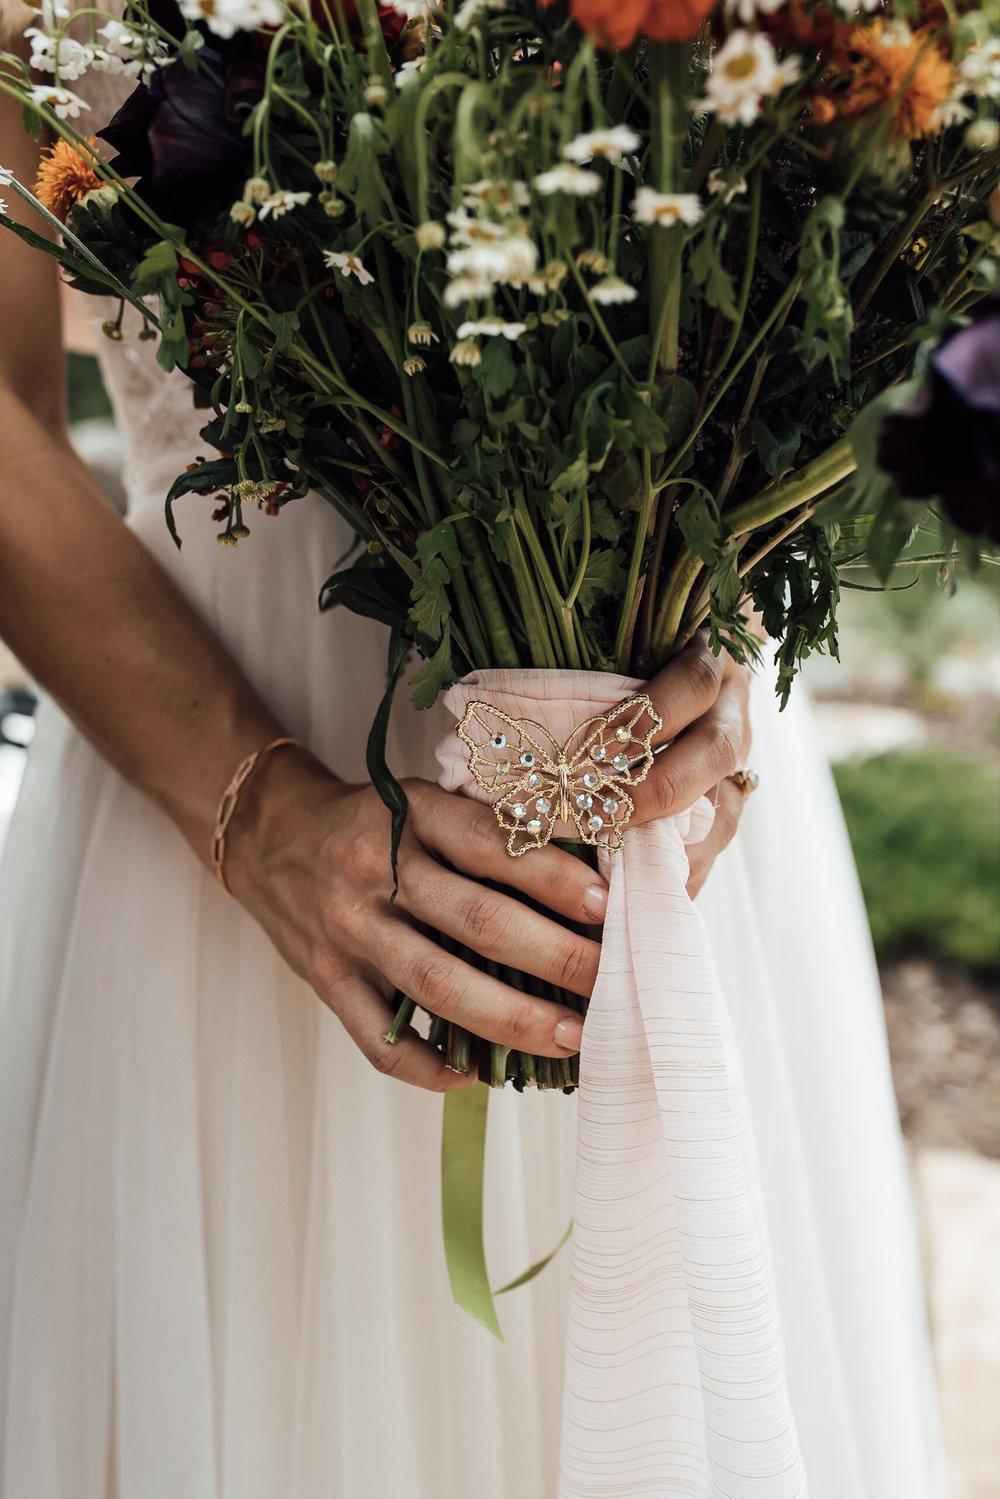 twin-lakes-colorado-colorado-wedding-photographer-twin-lakes-wedding-photographer-aspen-wedding-thewarmtharoundyou (3 of 5).jpg